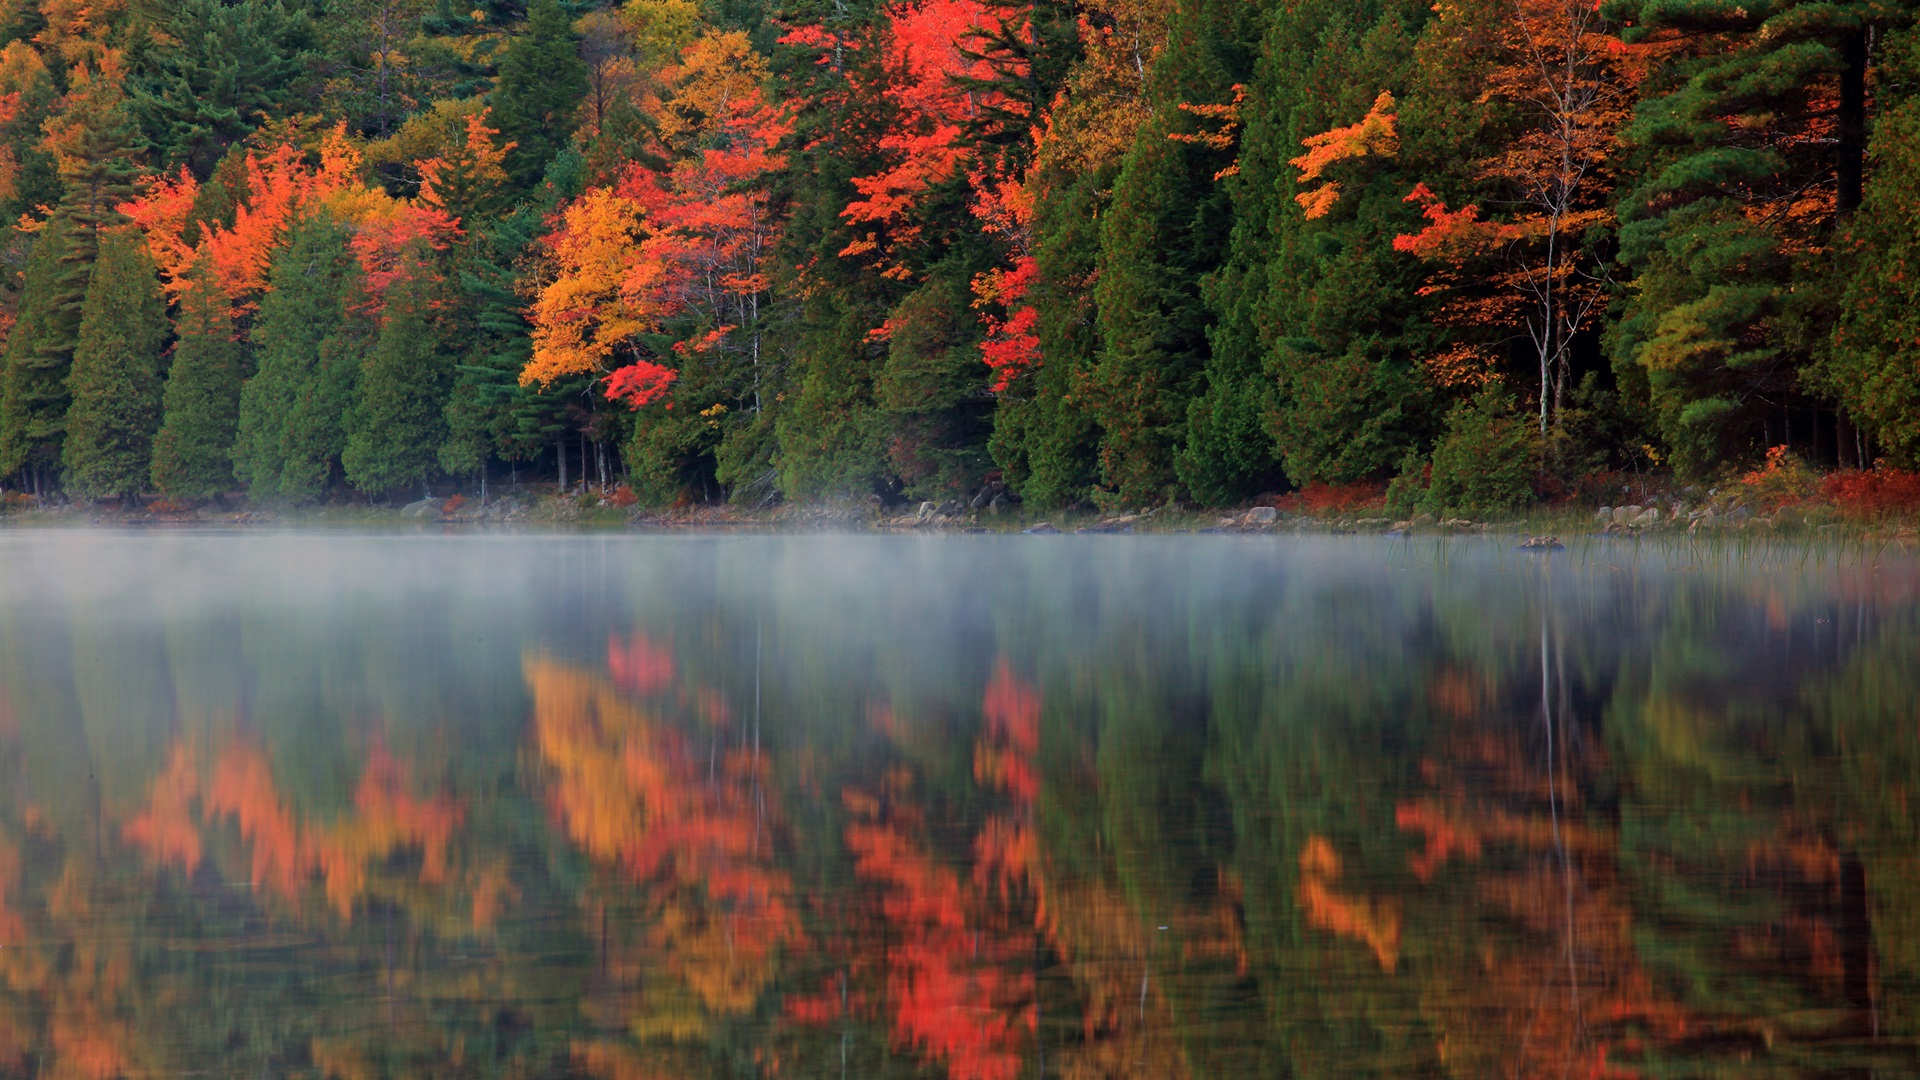 autumn nature river - photo #9